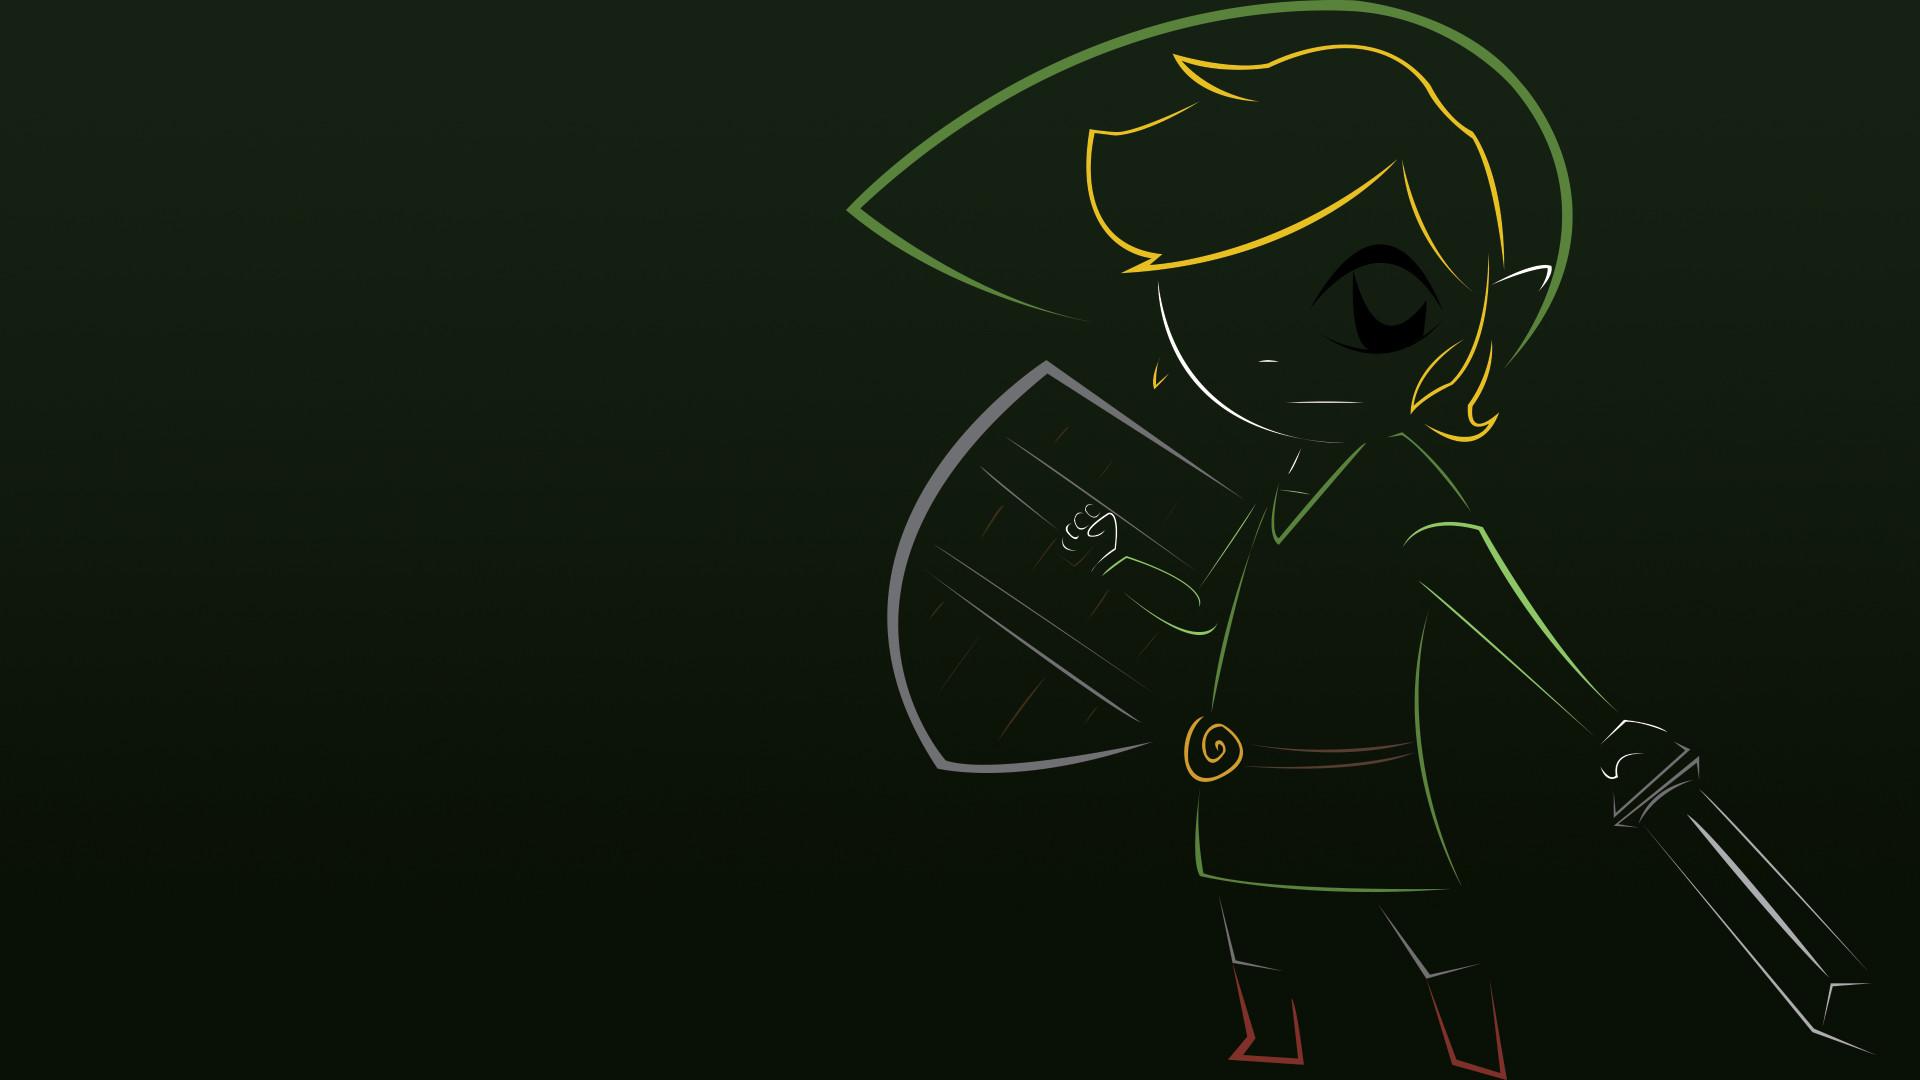 Best 25+ Zelda hd ideas on Pinterest   Legend of zelda poster, Holy video  and All best games